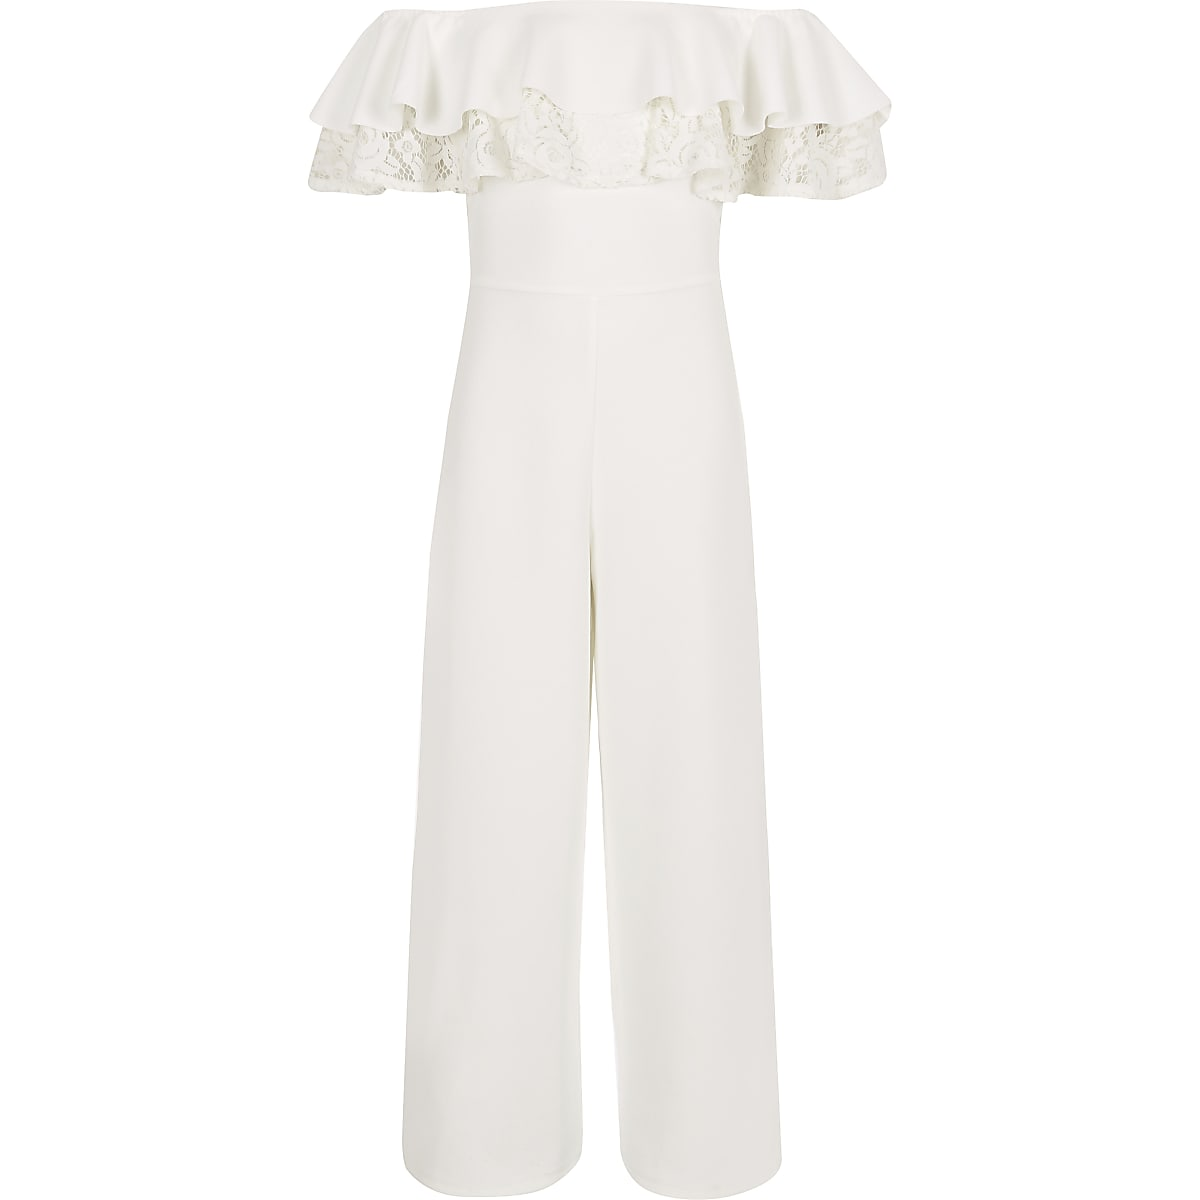 Girls white bardot lace trim jumpsuit